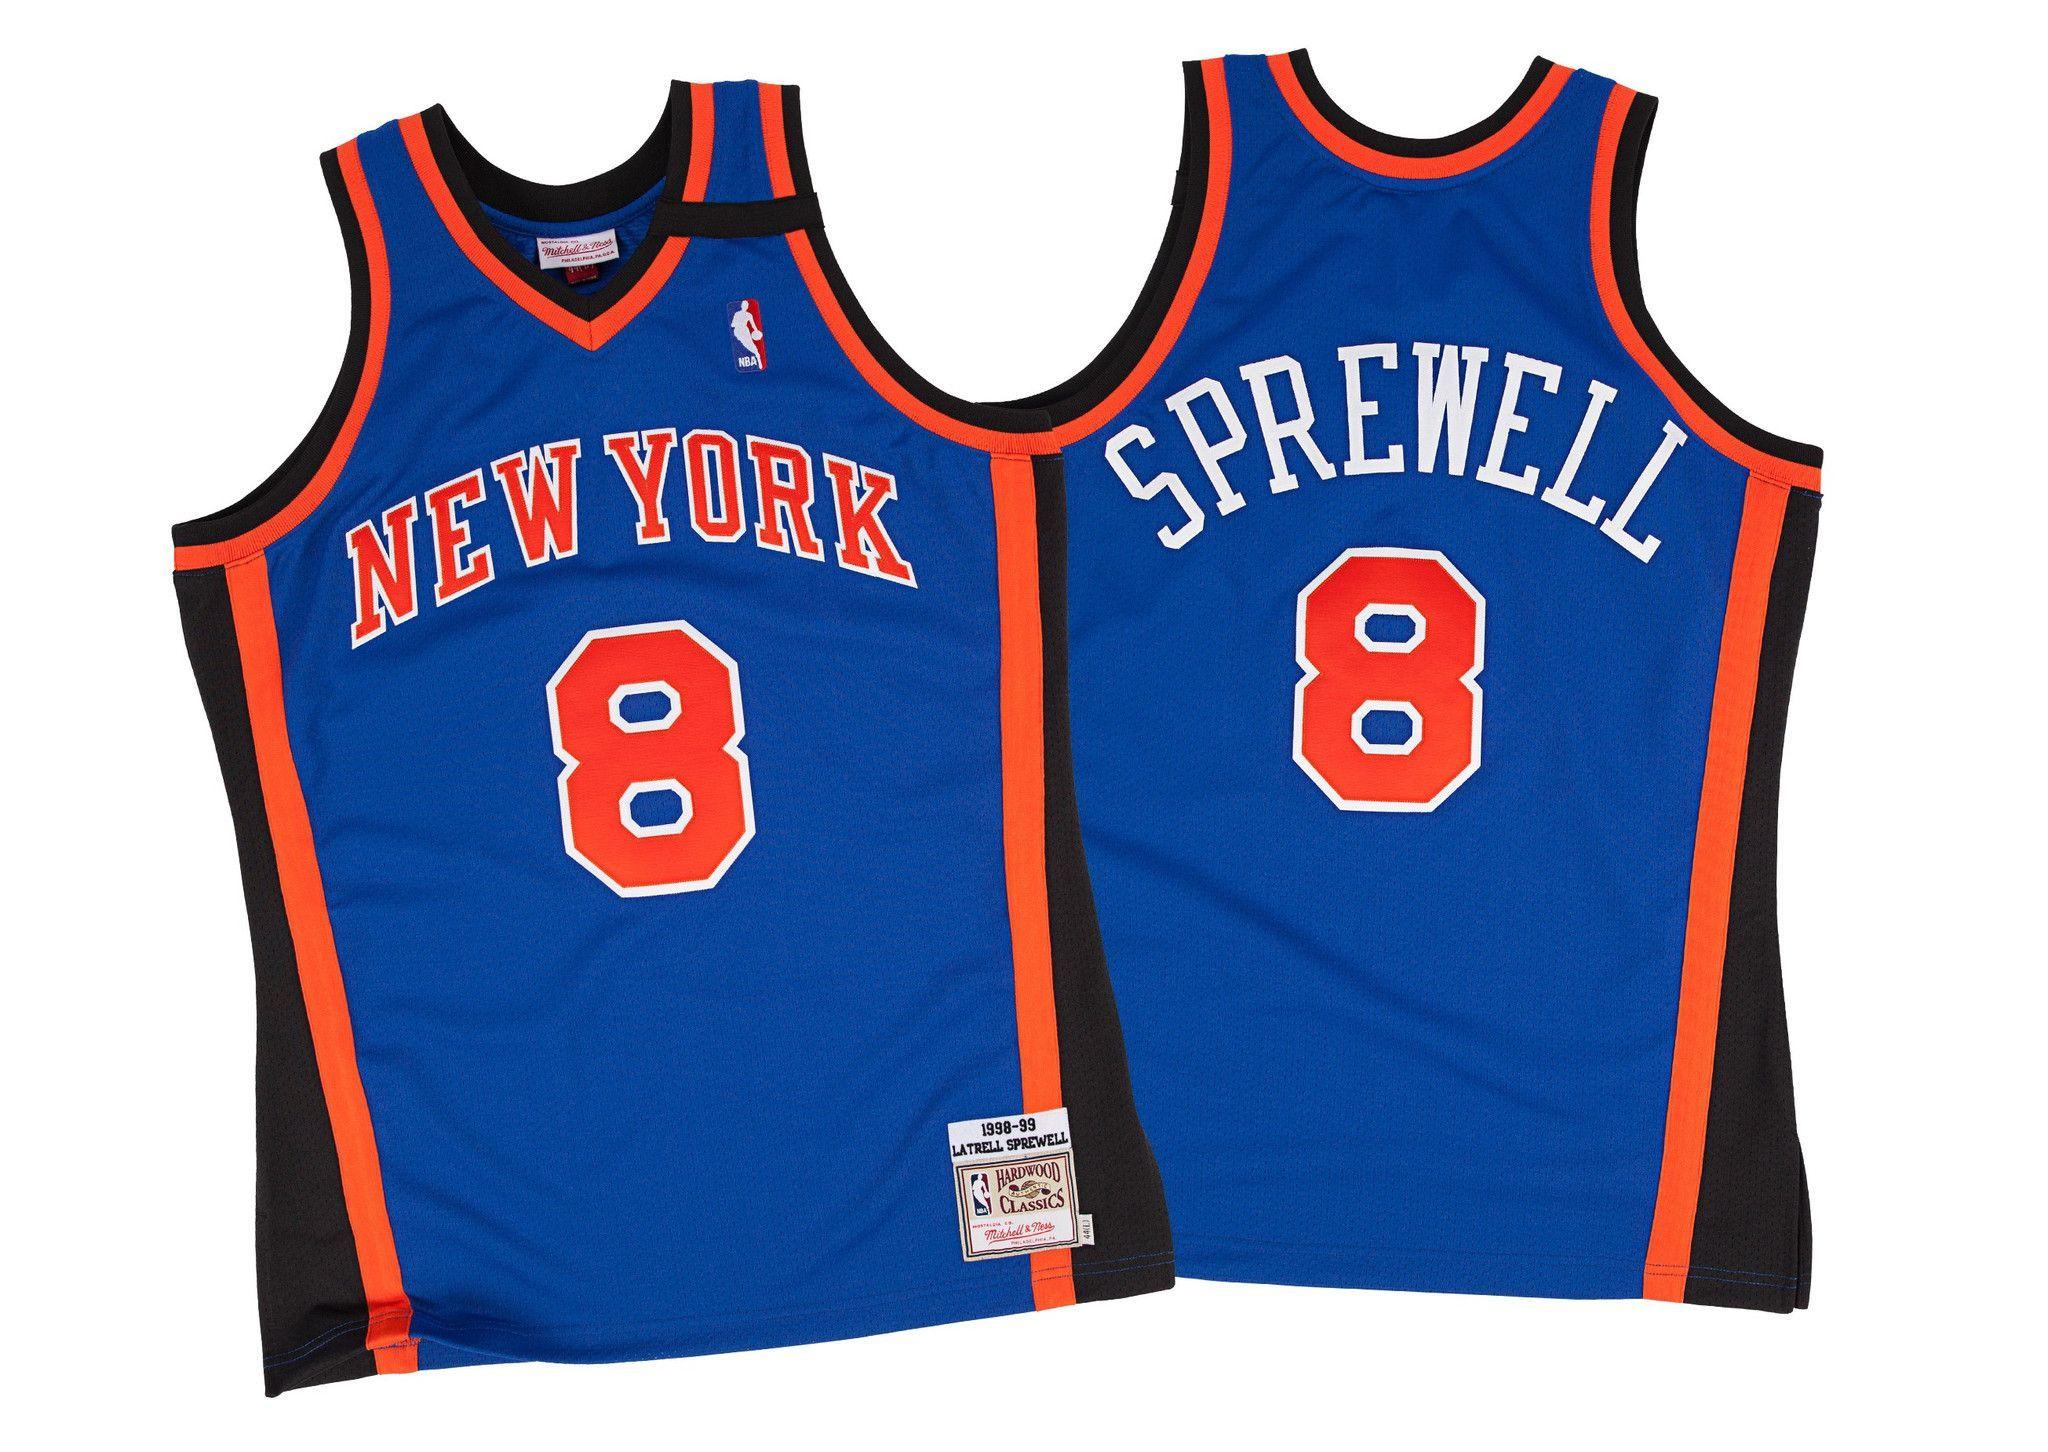 sale retailer 4392e de198 Latrell Sprewell 1998-99 Authentic Jersey New York Knicks ...